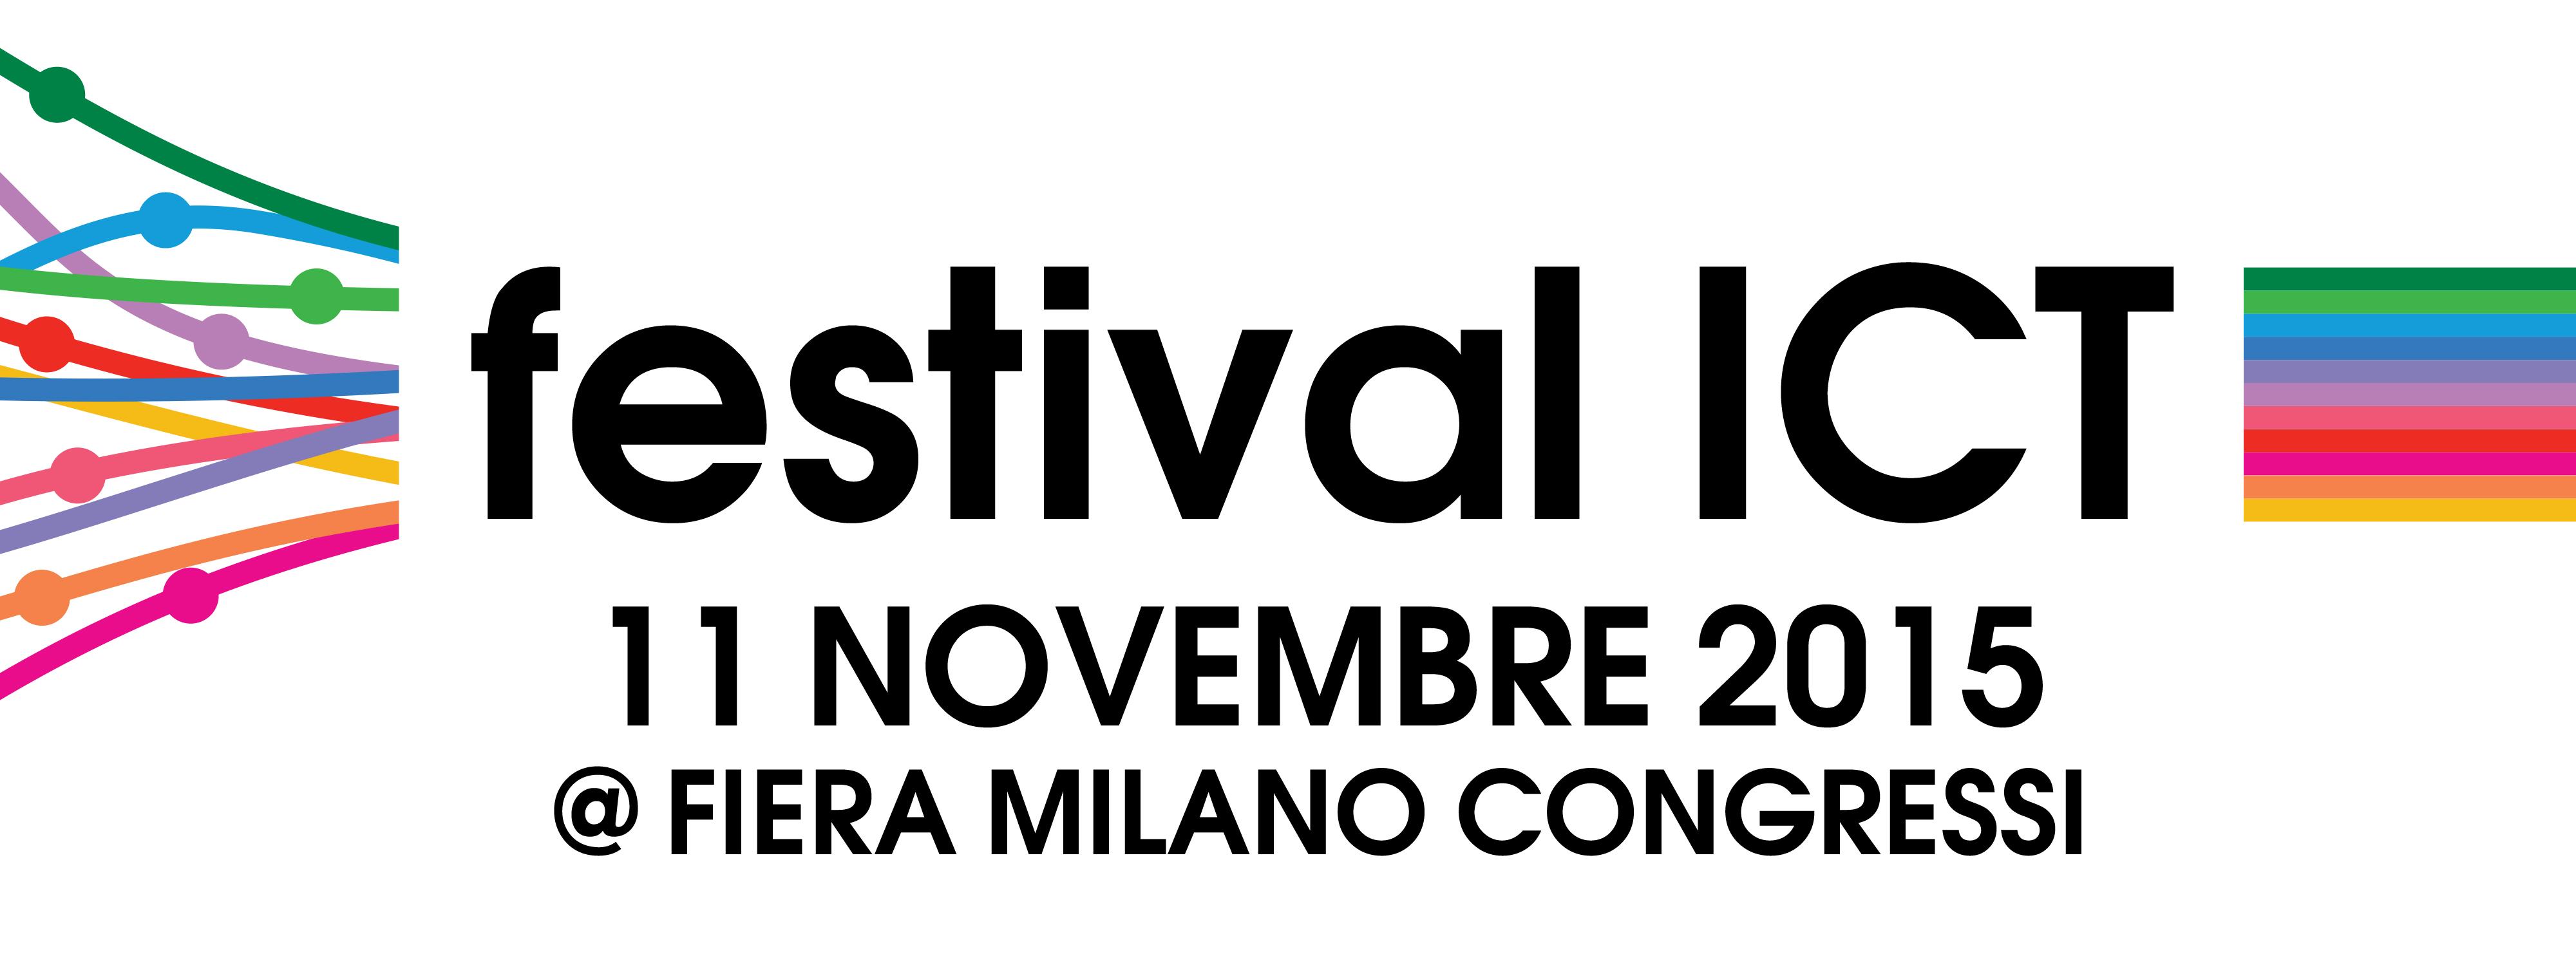 logo-festivalict2015